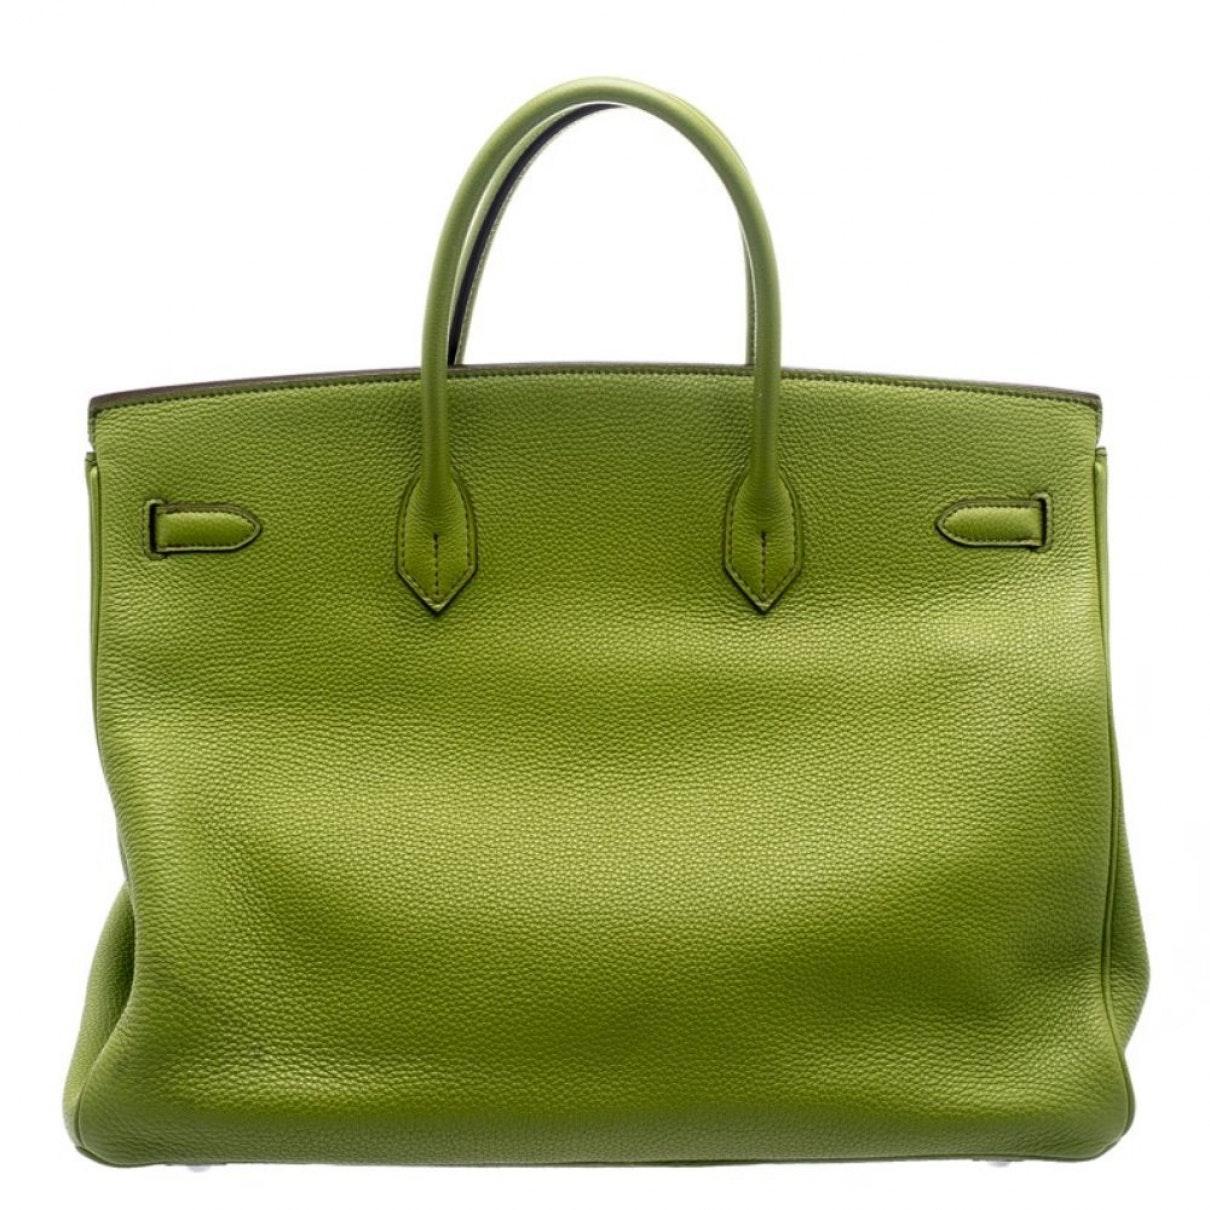 Sacs à main Birkin 40 Cuir Hermès en coloris Vert